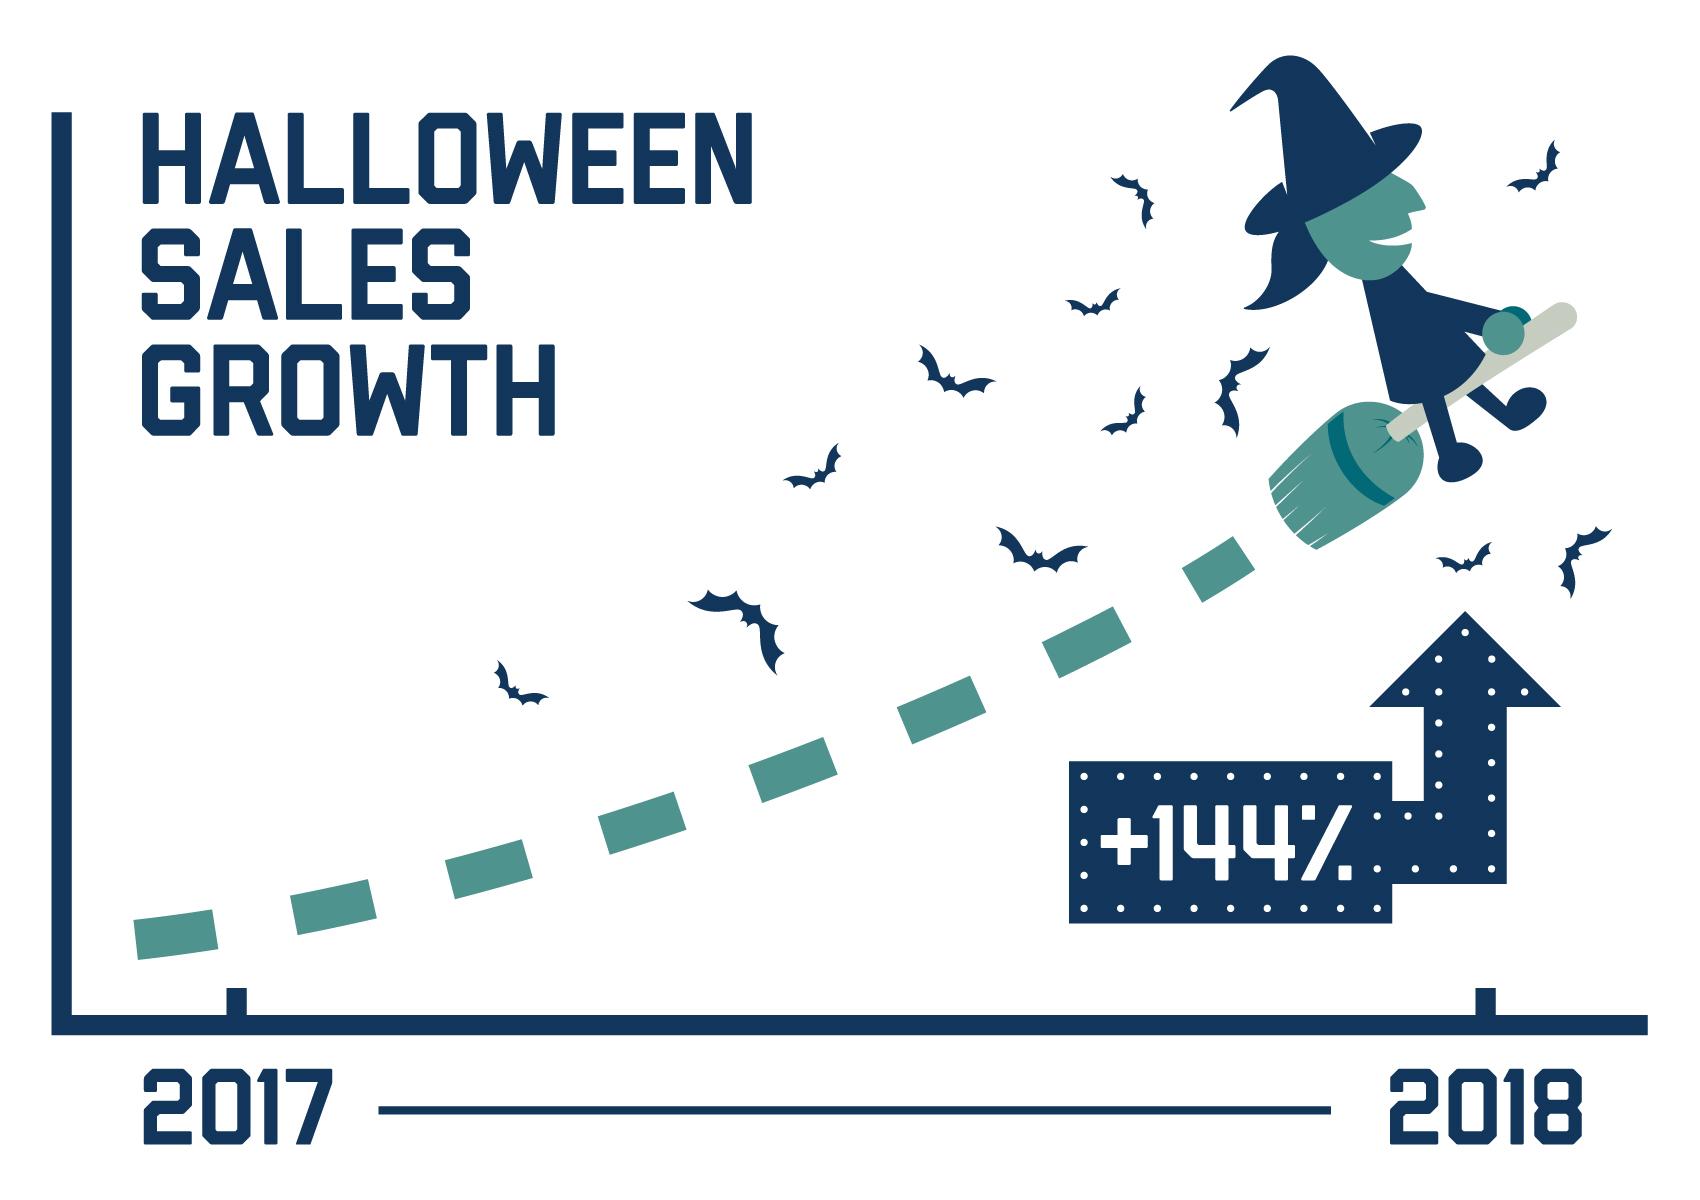 Halloween-Sales-17-and-18.jpg